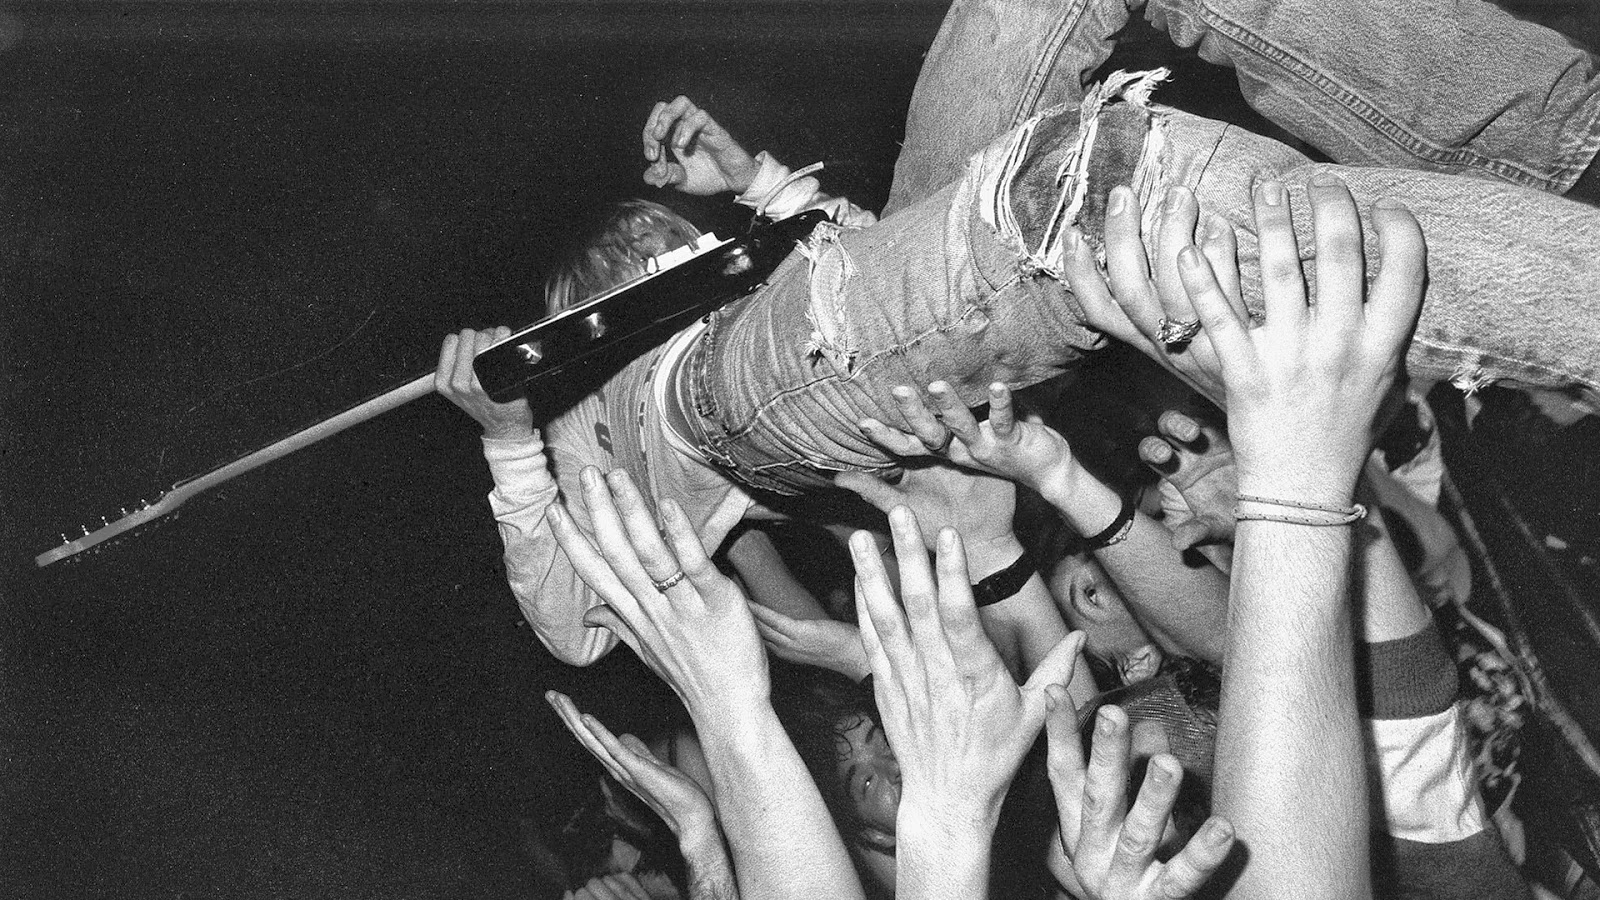 Kurt Cobain grunge mosh pit